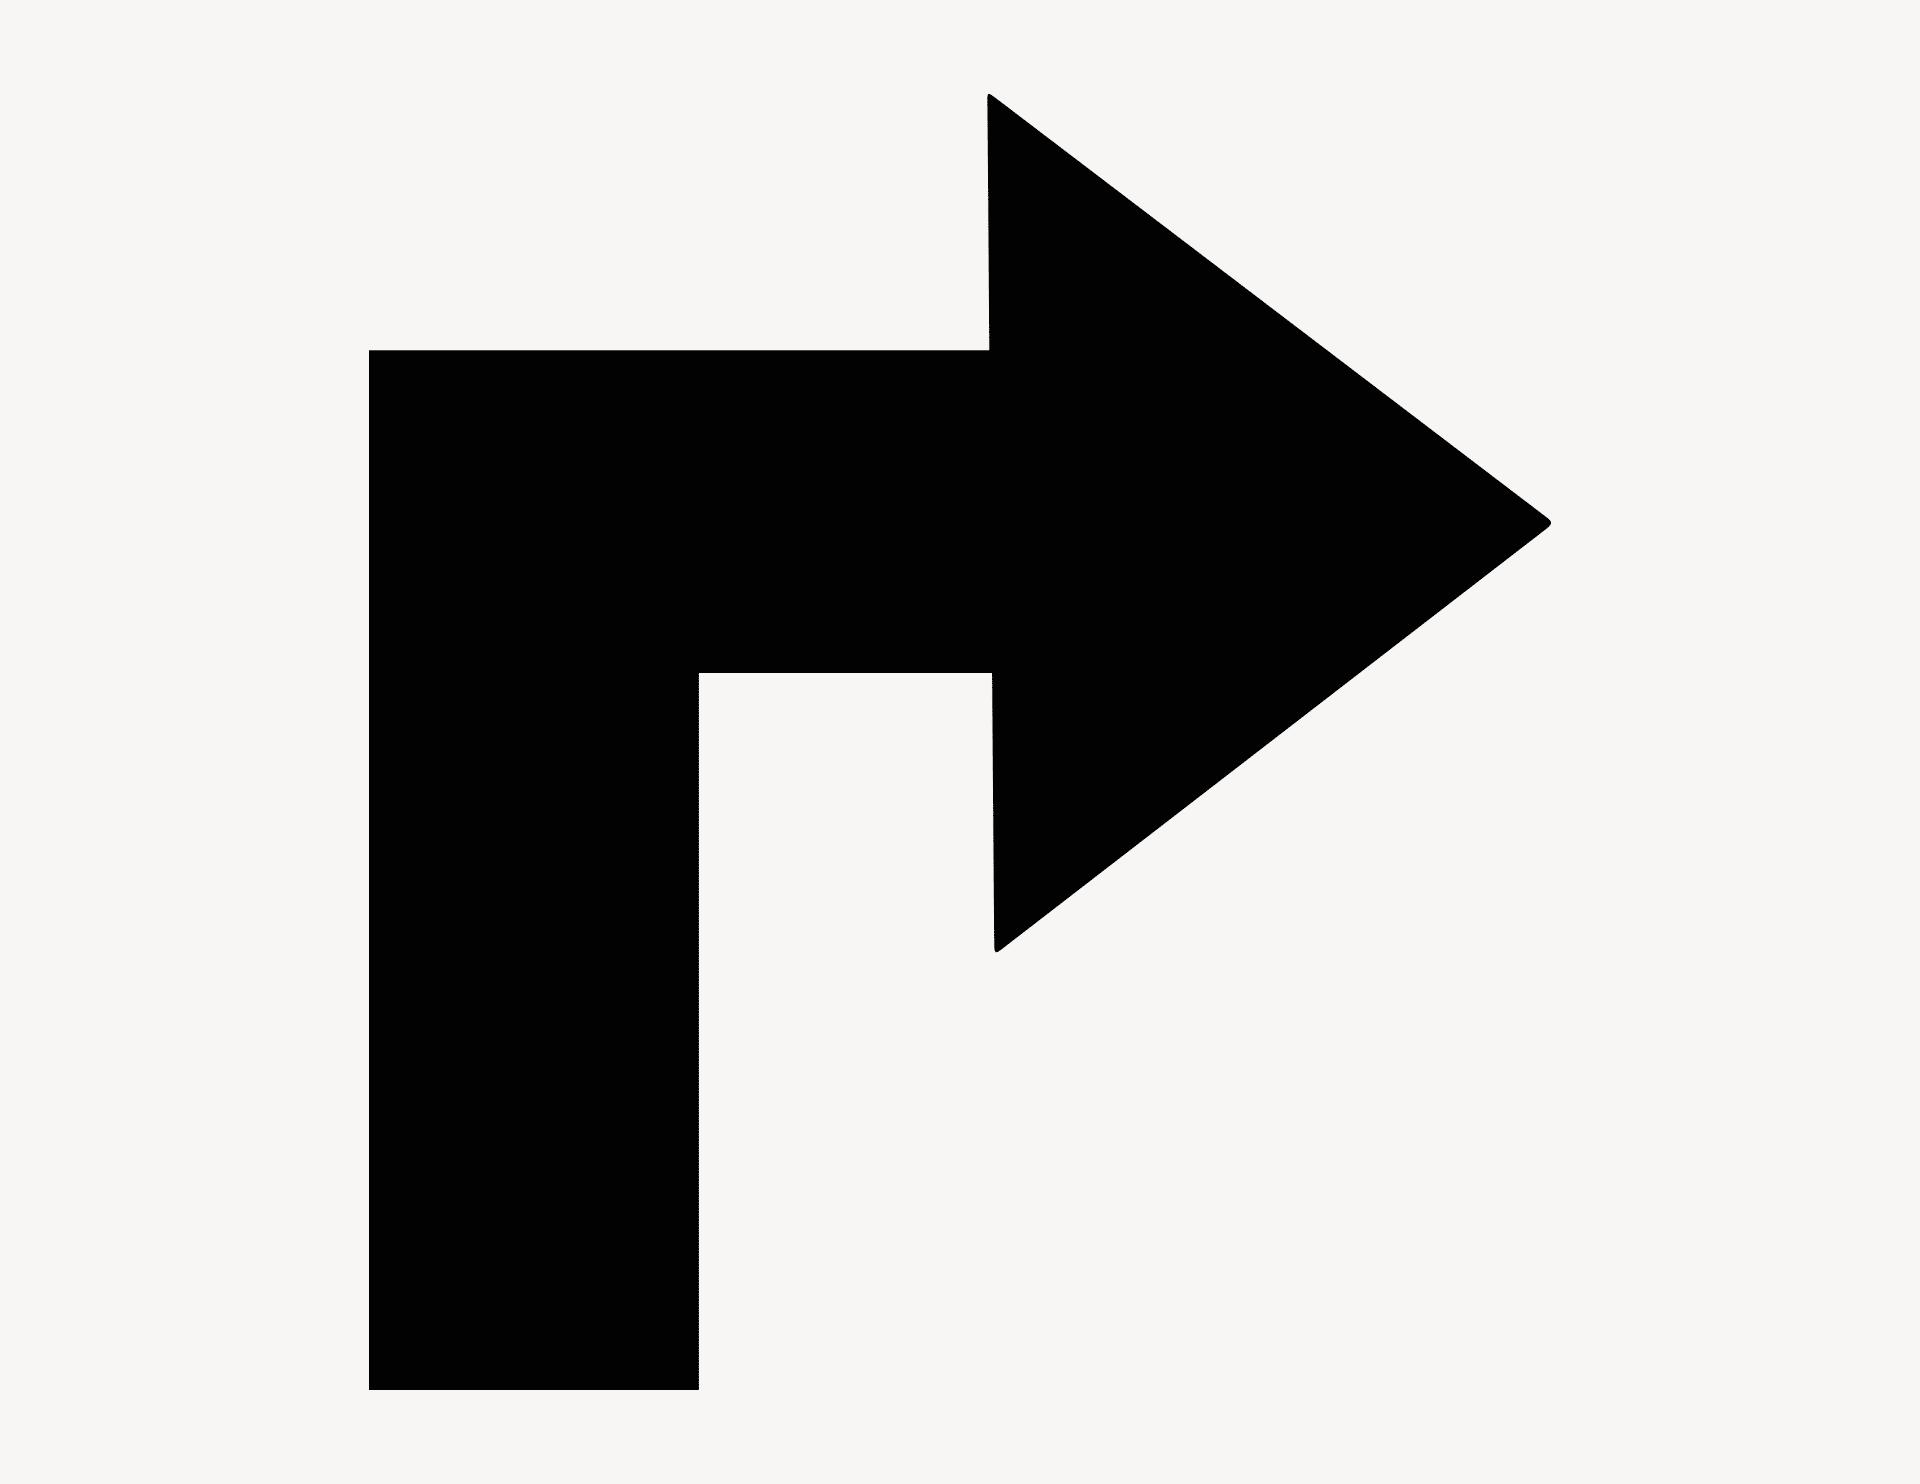 Pfeil Finn-Ecke rechts - Aufkleber für Gewerbe